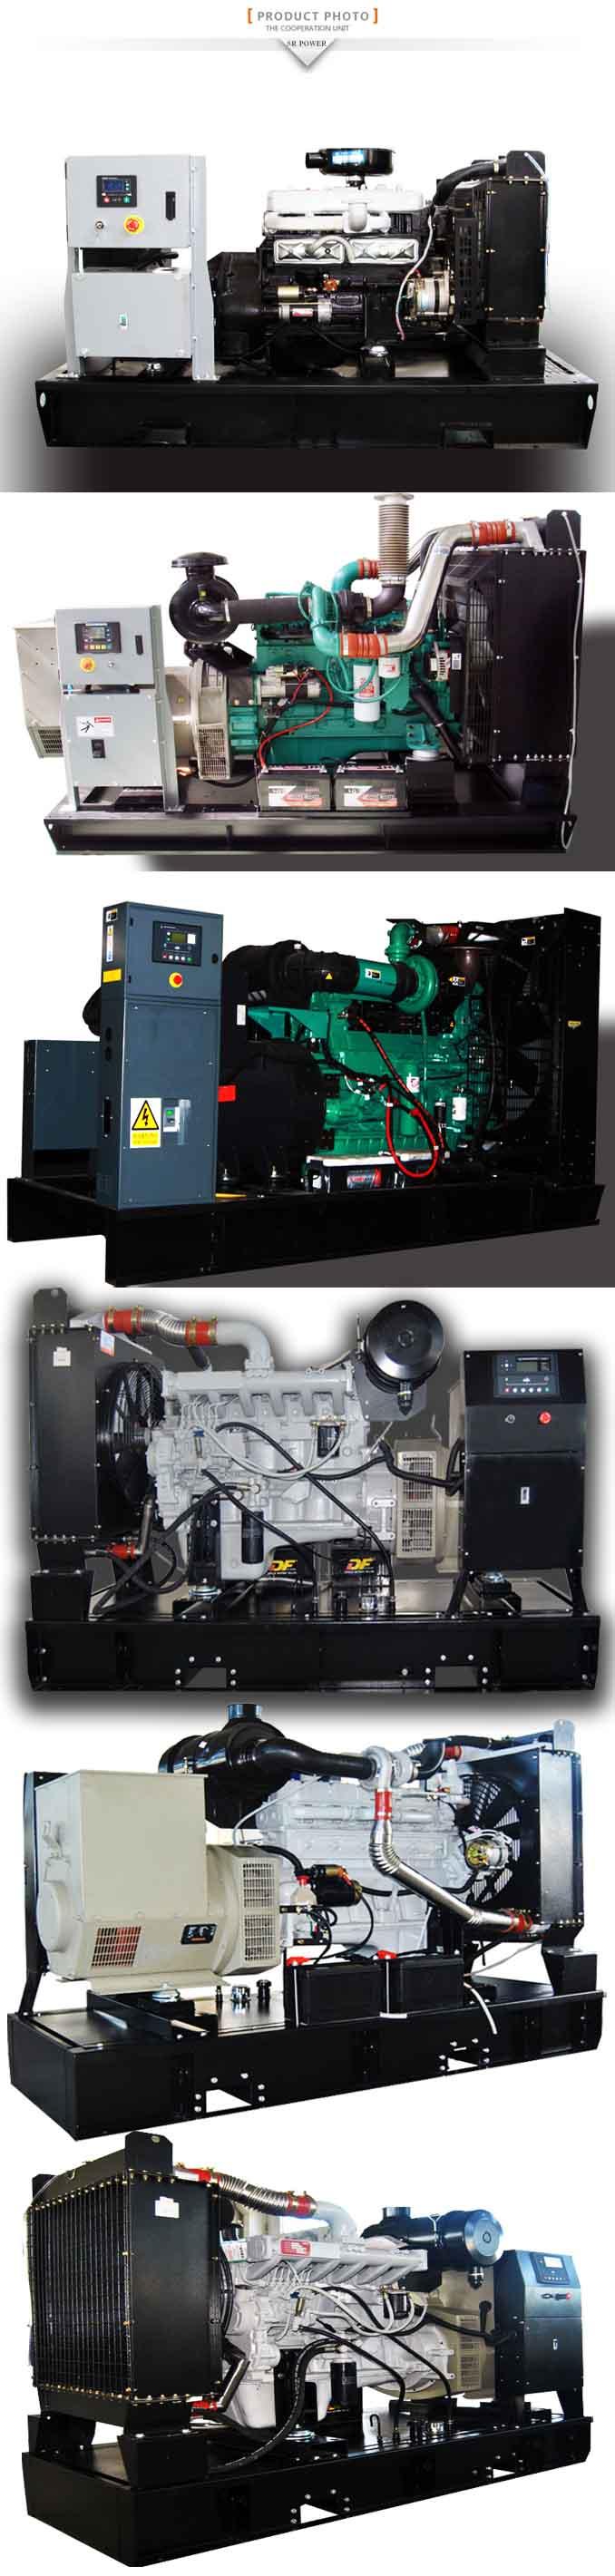 50hz 15kva 12kw 400v Harge Genset 10 Kva Diesel Generator Price